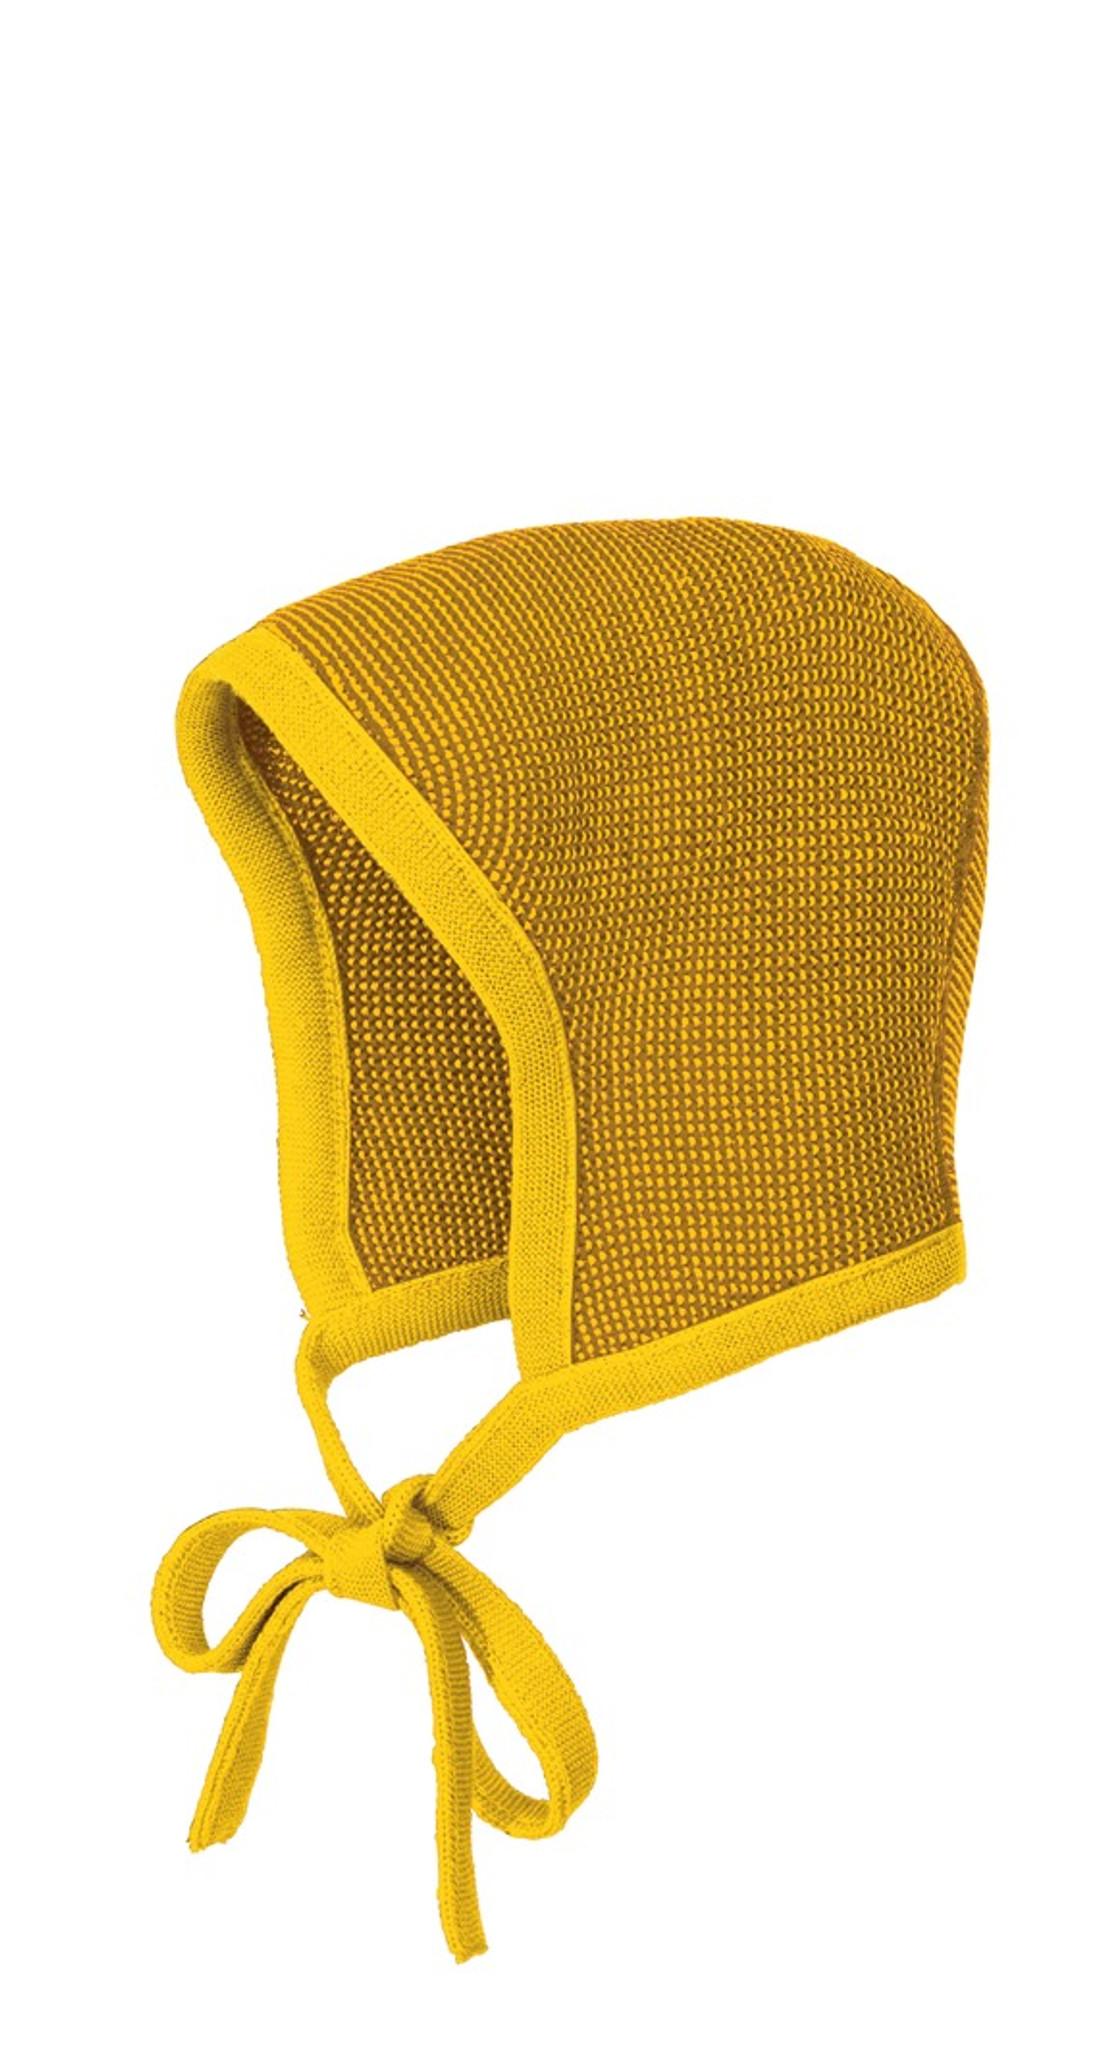 ENGEL Hat 100/% MERINO WOOL baby newborn organic virgin new fleece bonnet winter